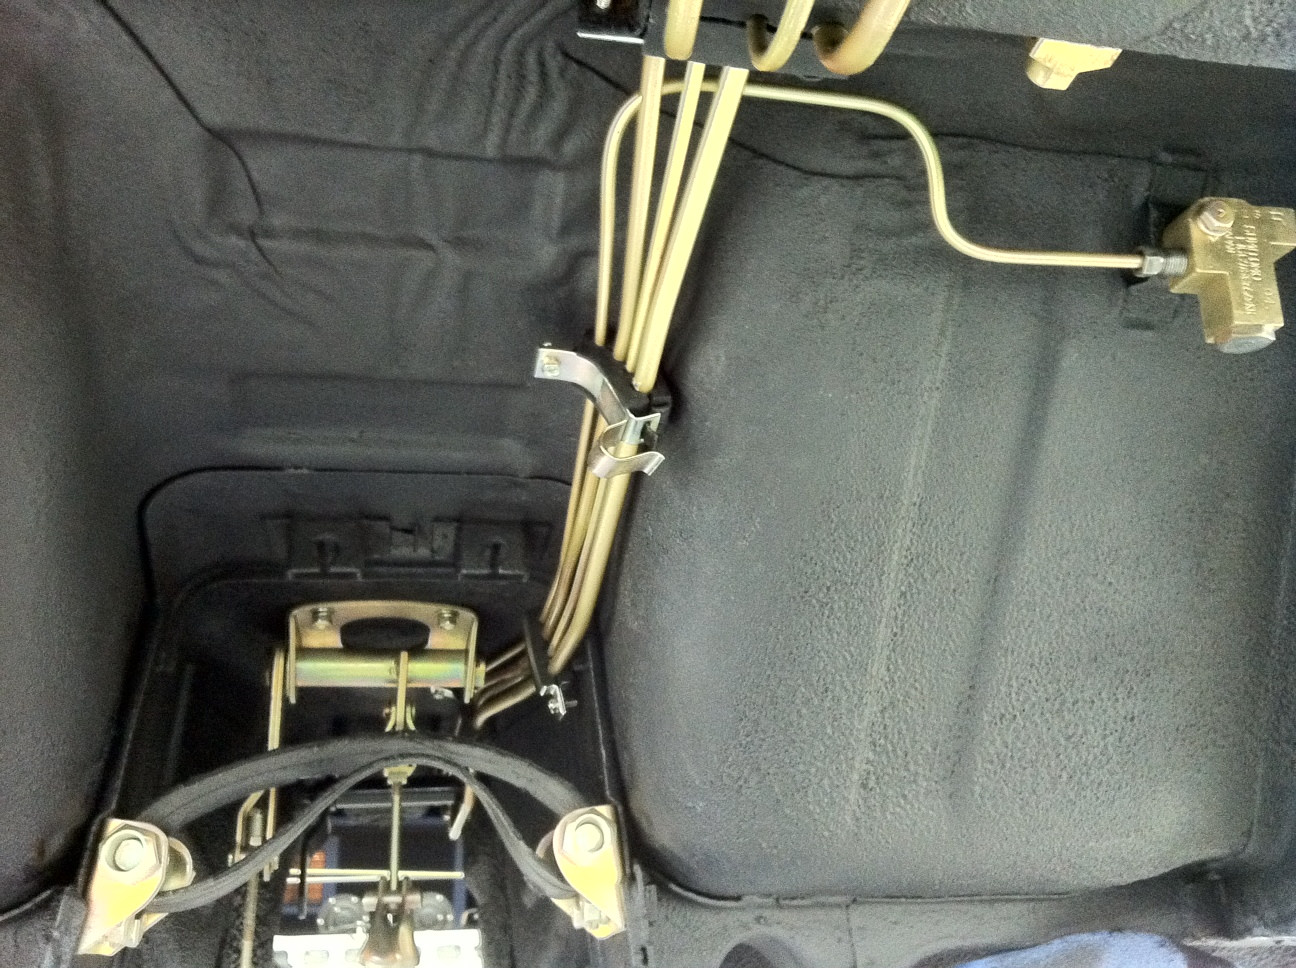 brake and fuel line insulators